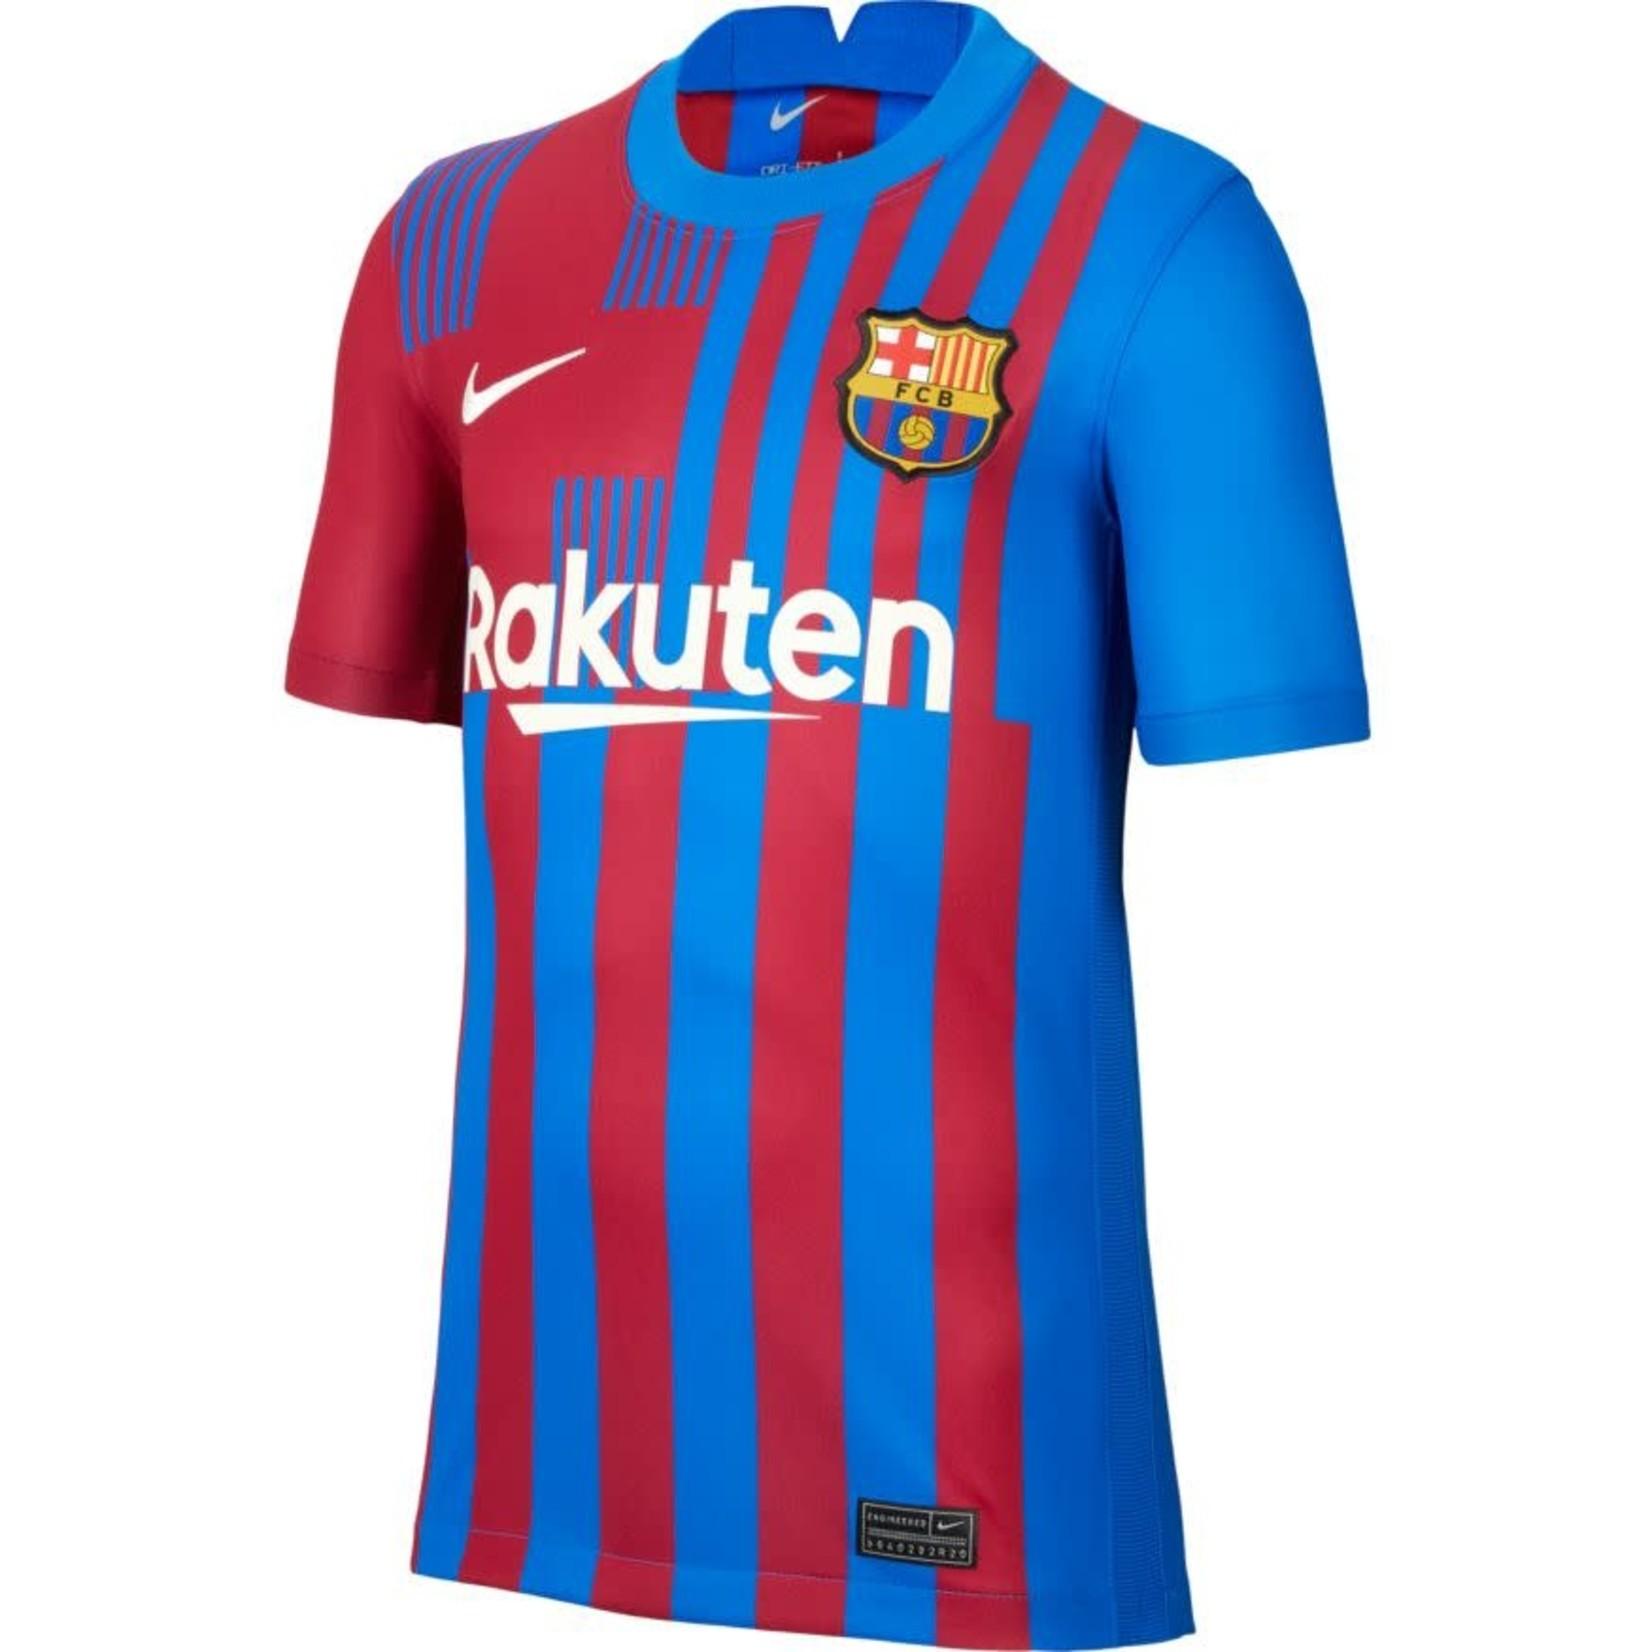 NIKE FC BARCELONA 21/22 HOME JERSEY YOUTH (MAROON/BLUE)